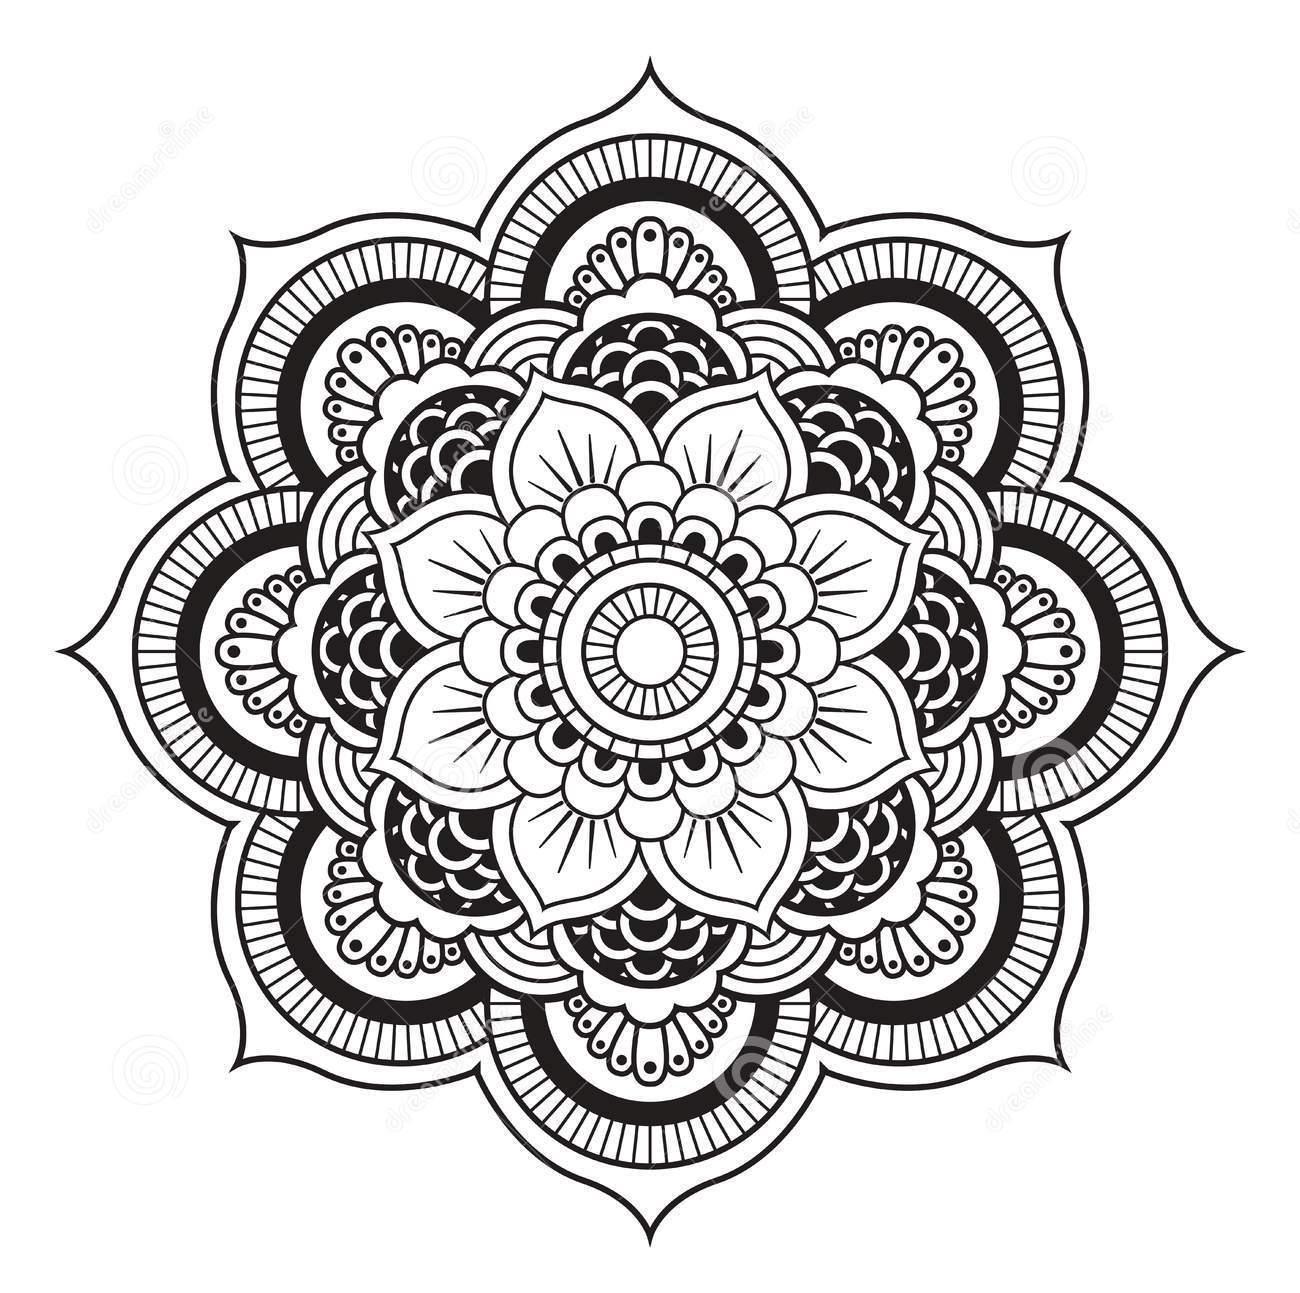 bildergebnis fr mandala what is a mandala mandala ethnic decorative 1300x1293